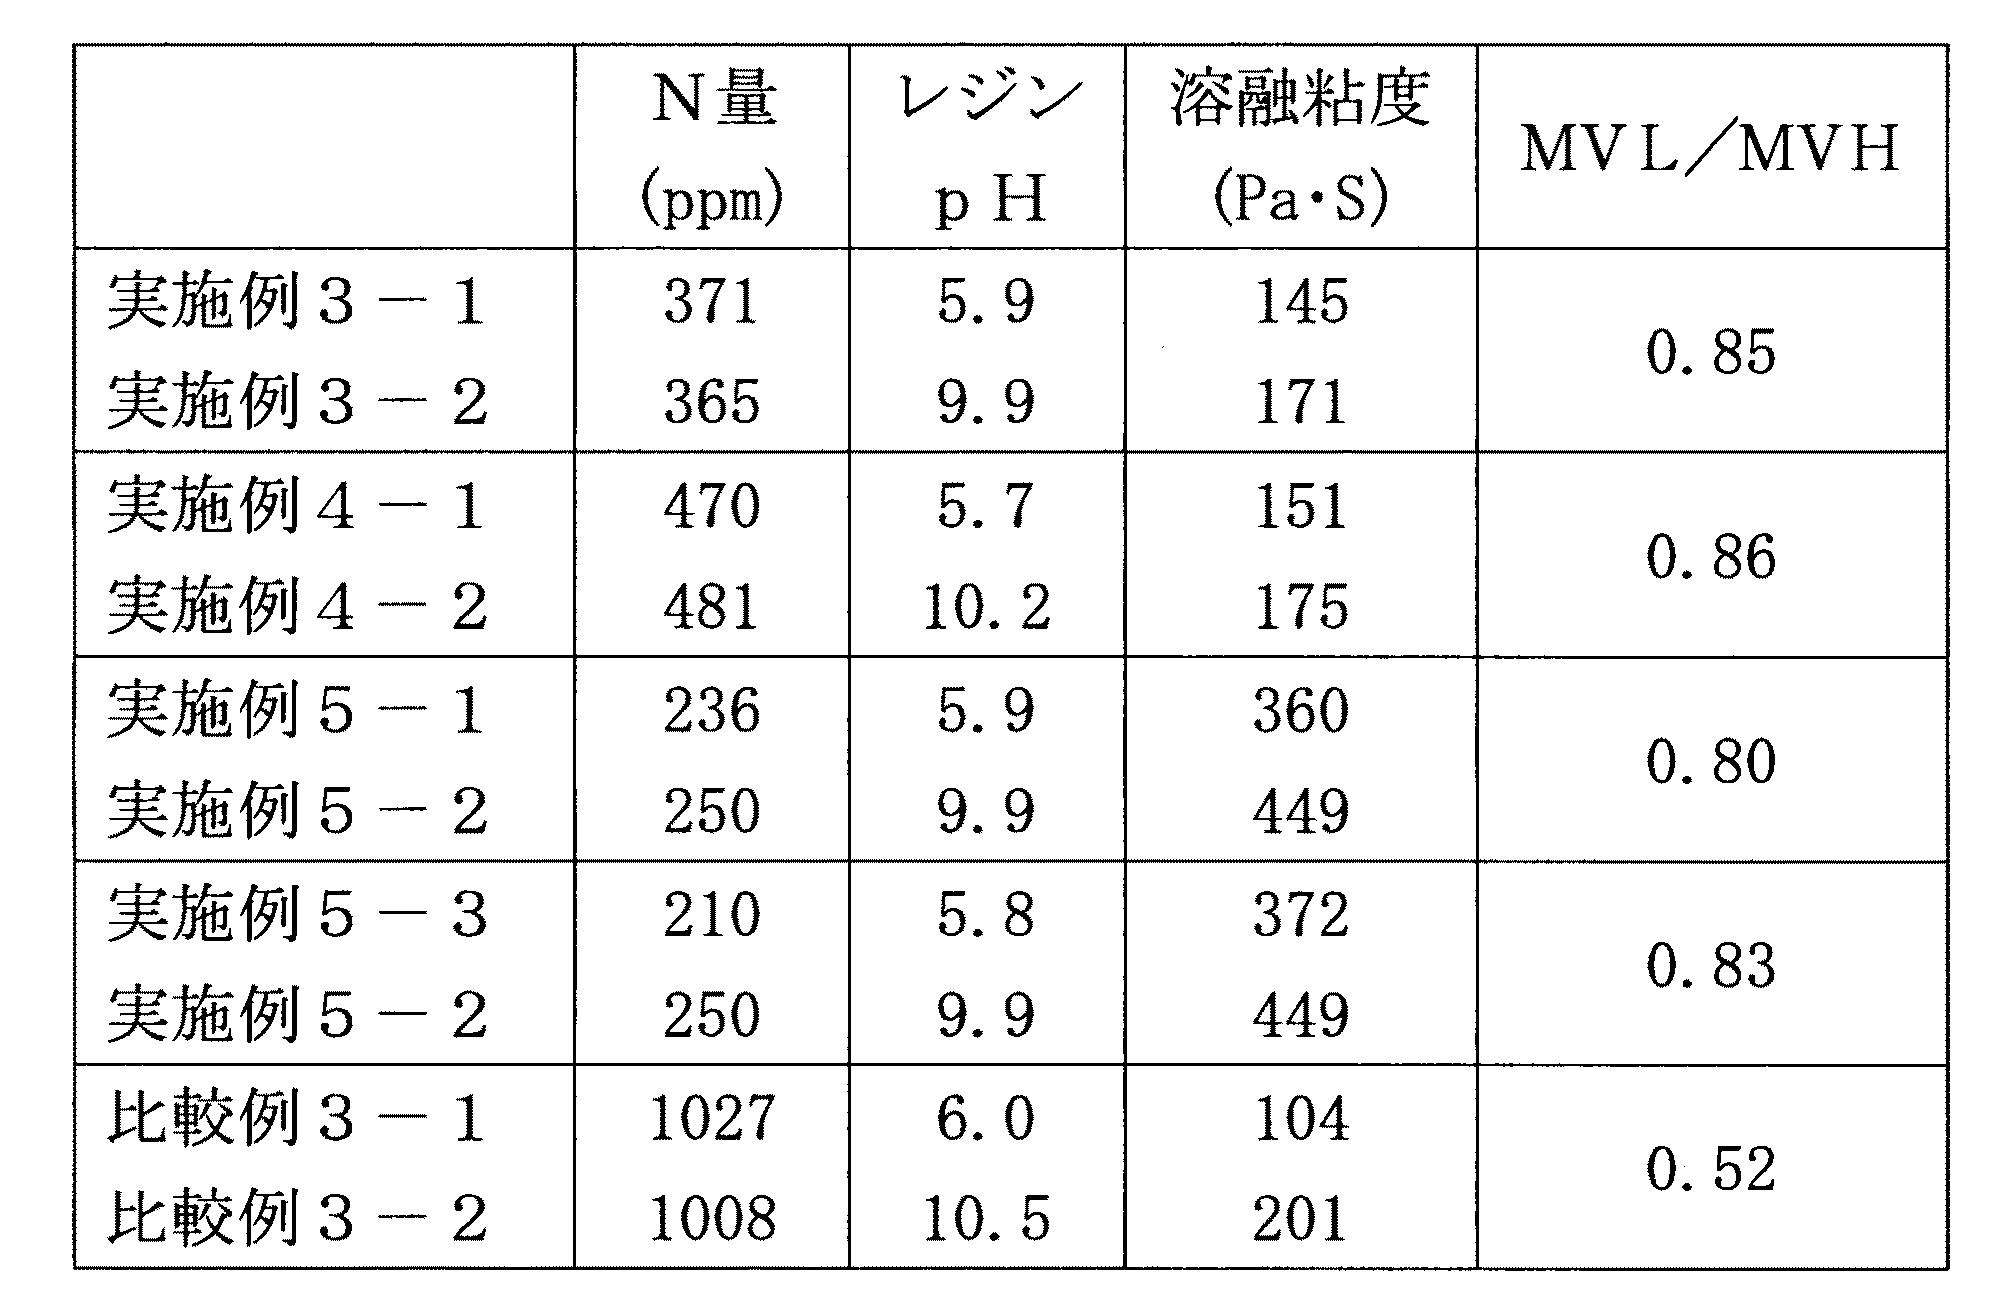 Figure 2004244619